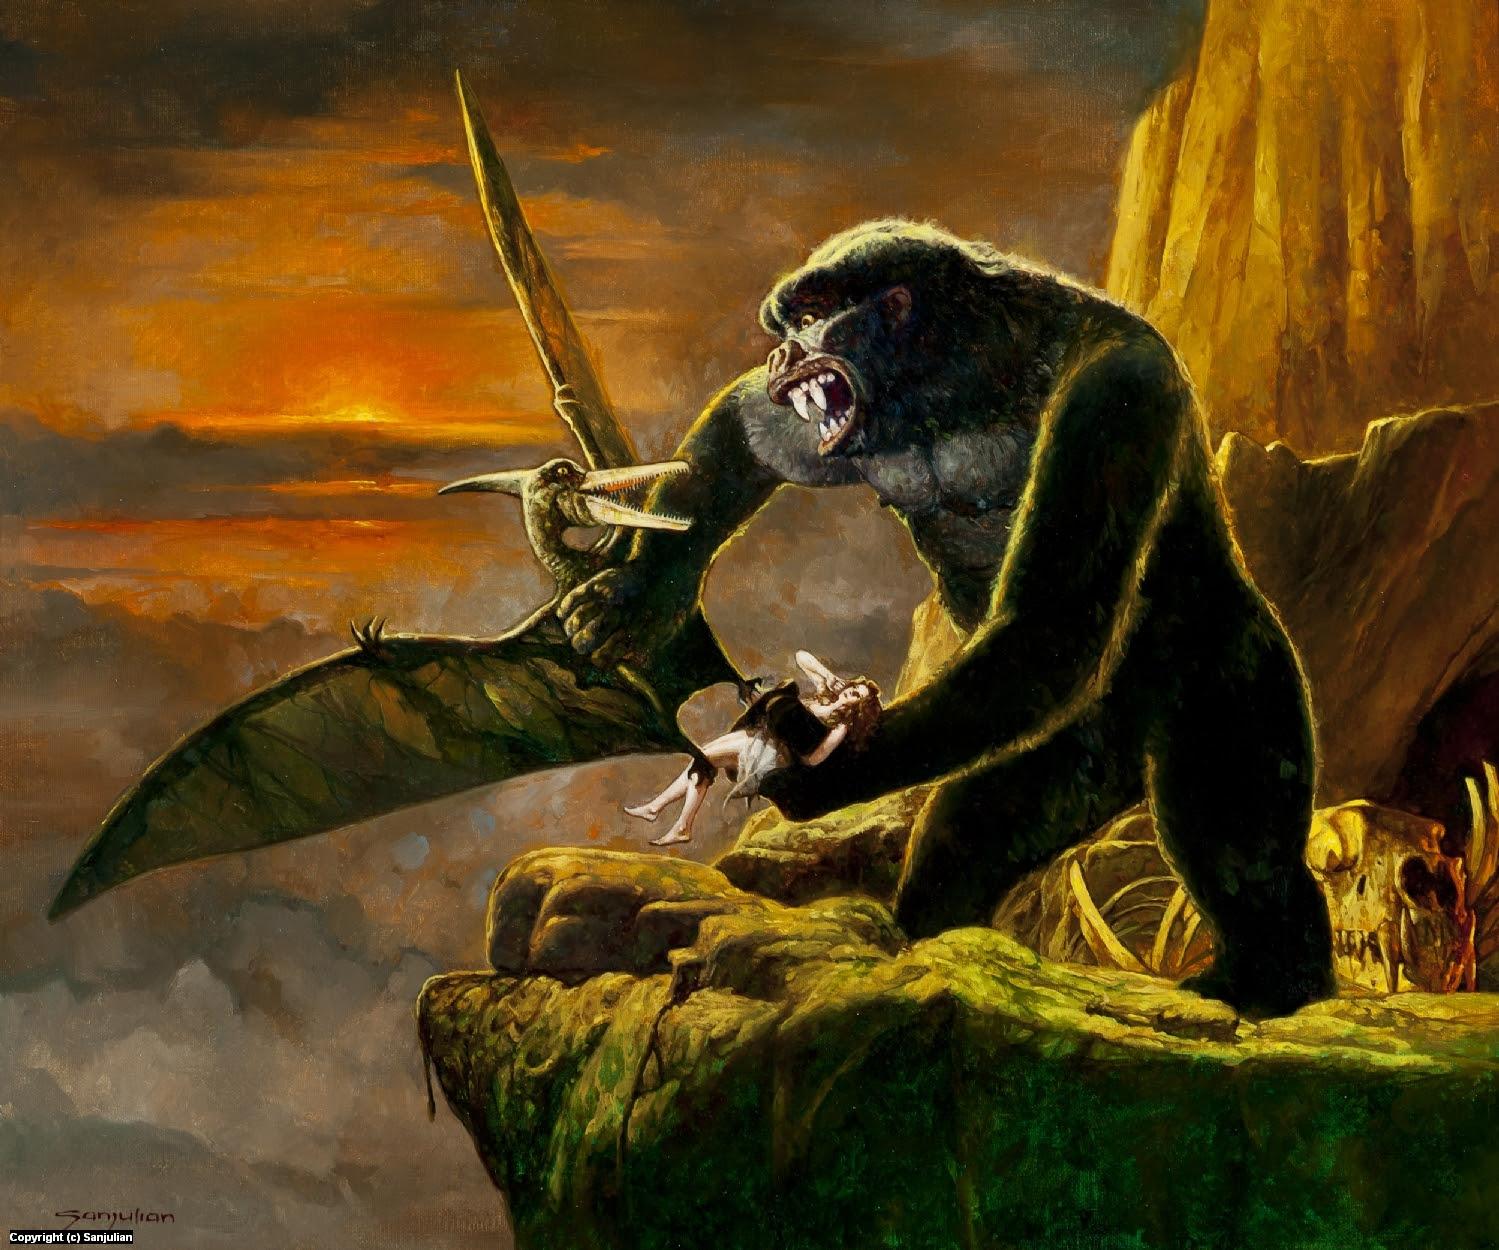 King Kong Artwork by Manuel Sanjulian